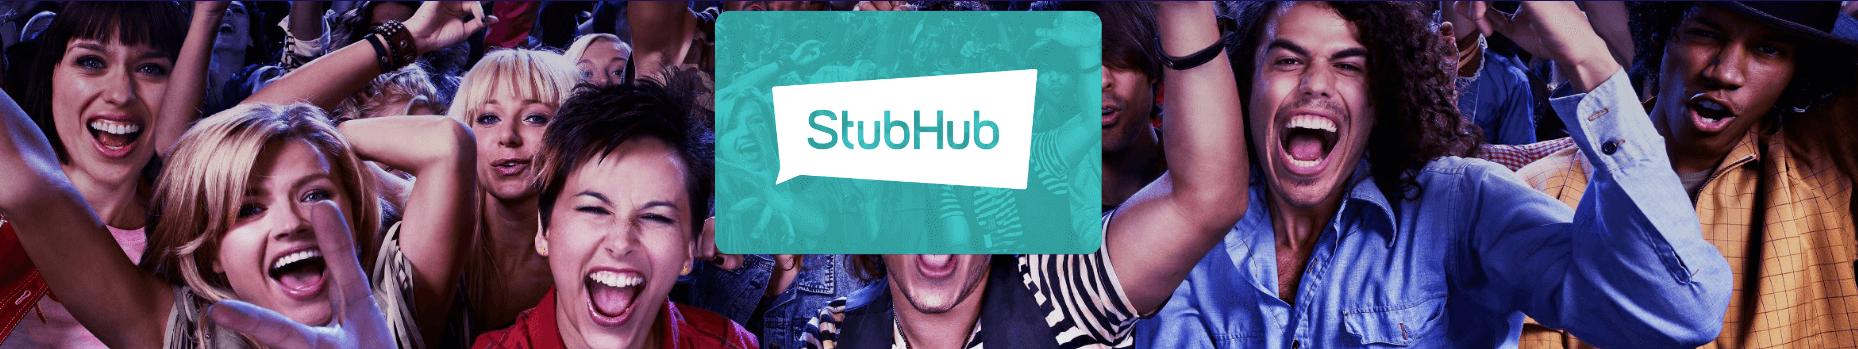 Stubhub coupon code $20